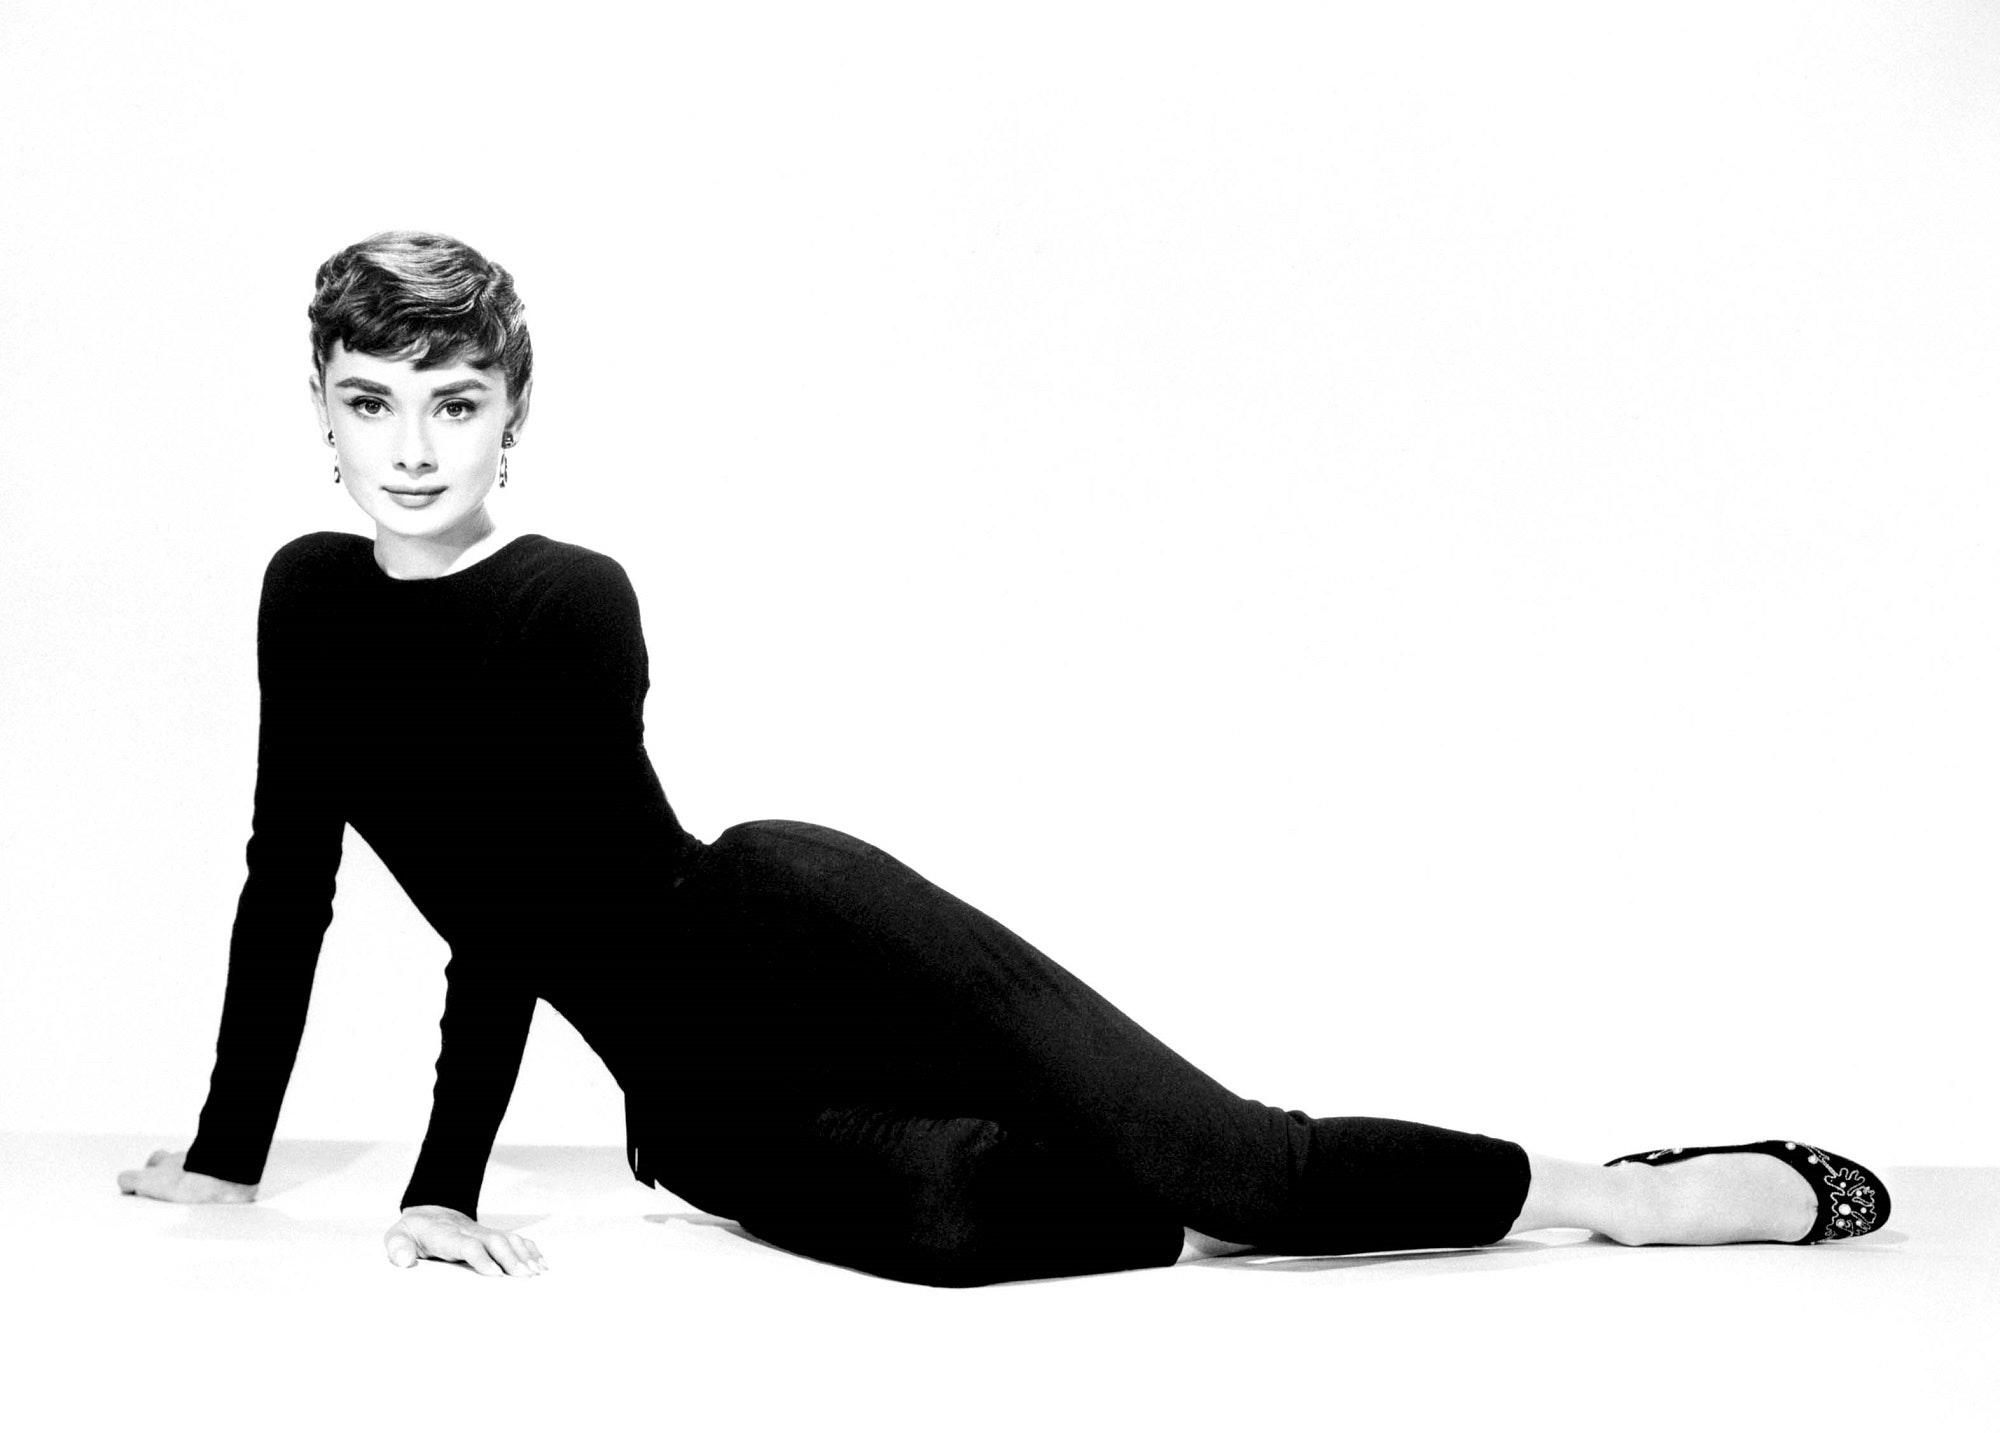 Auguri a Audrey Hepburn, l'attrice con un passato partigiano